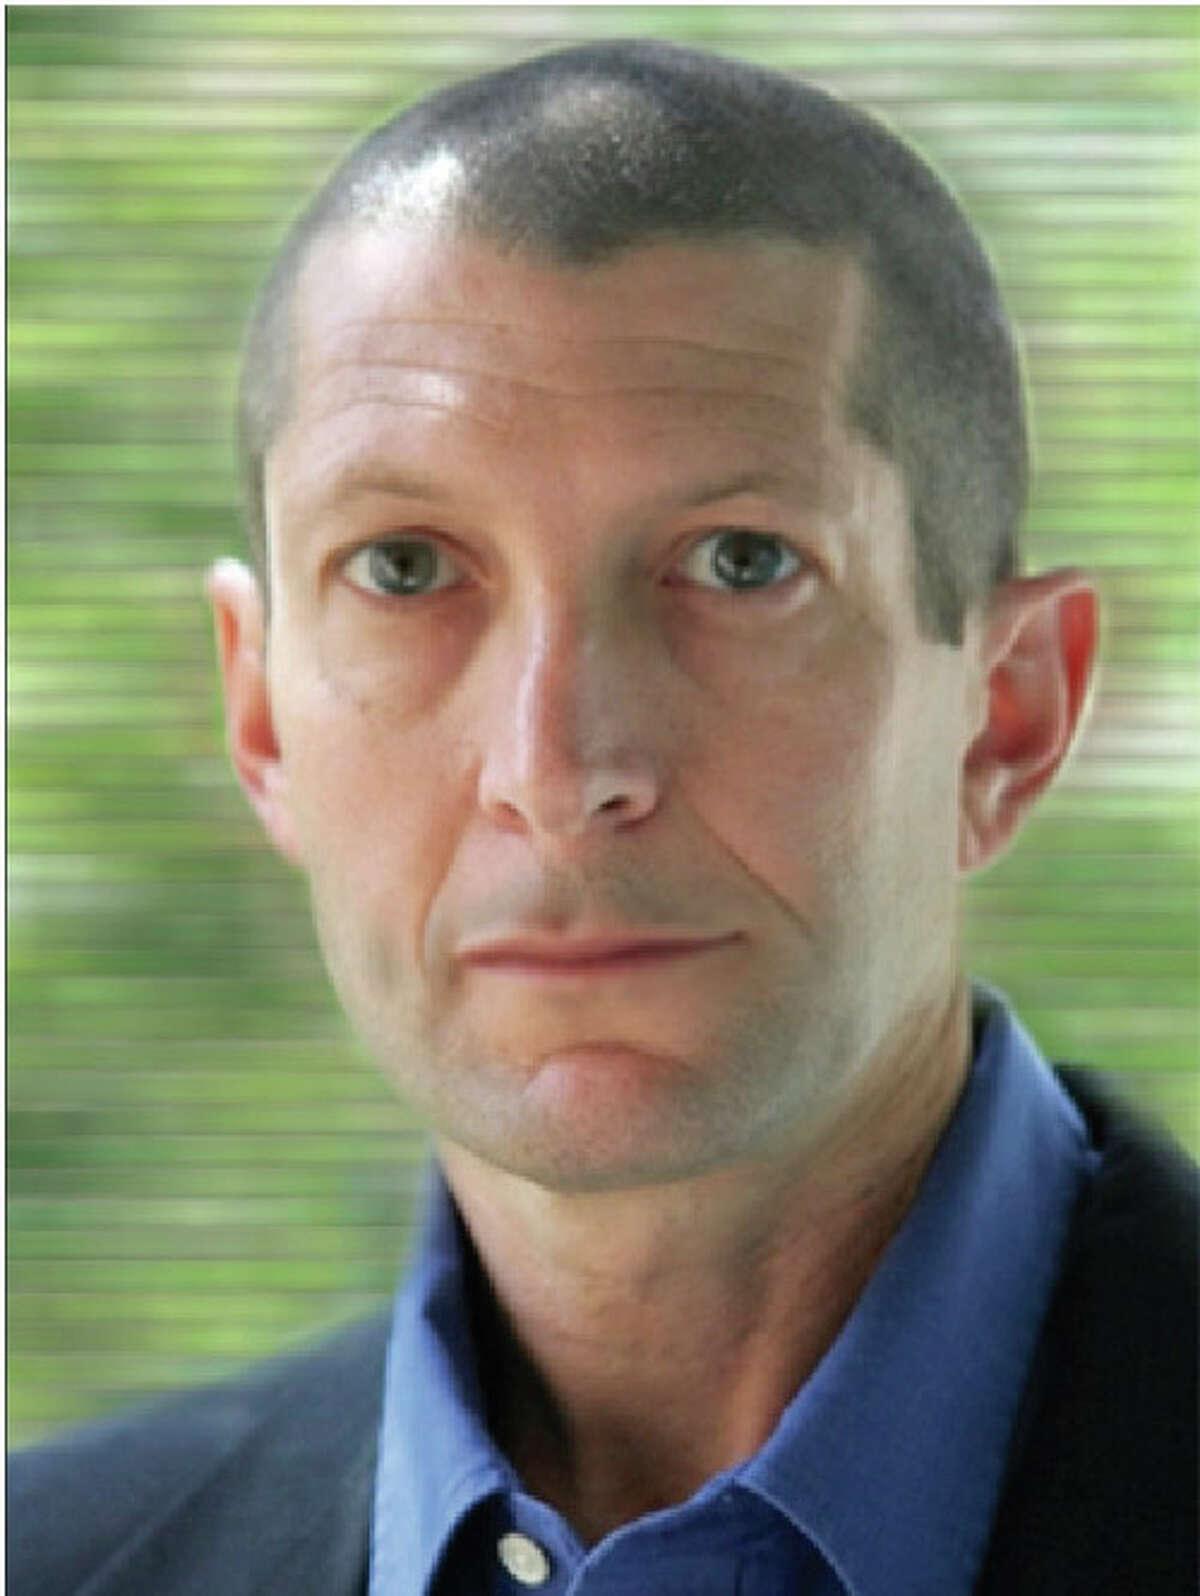 Professor David Dow, an University of Houston Law Center.